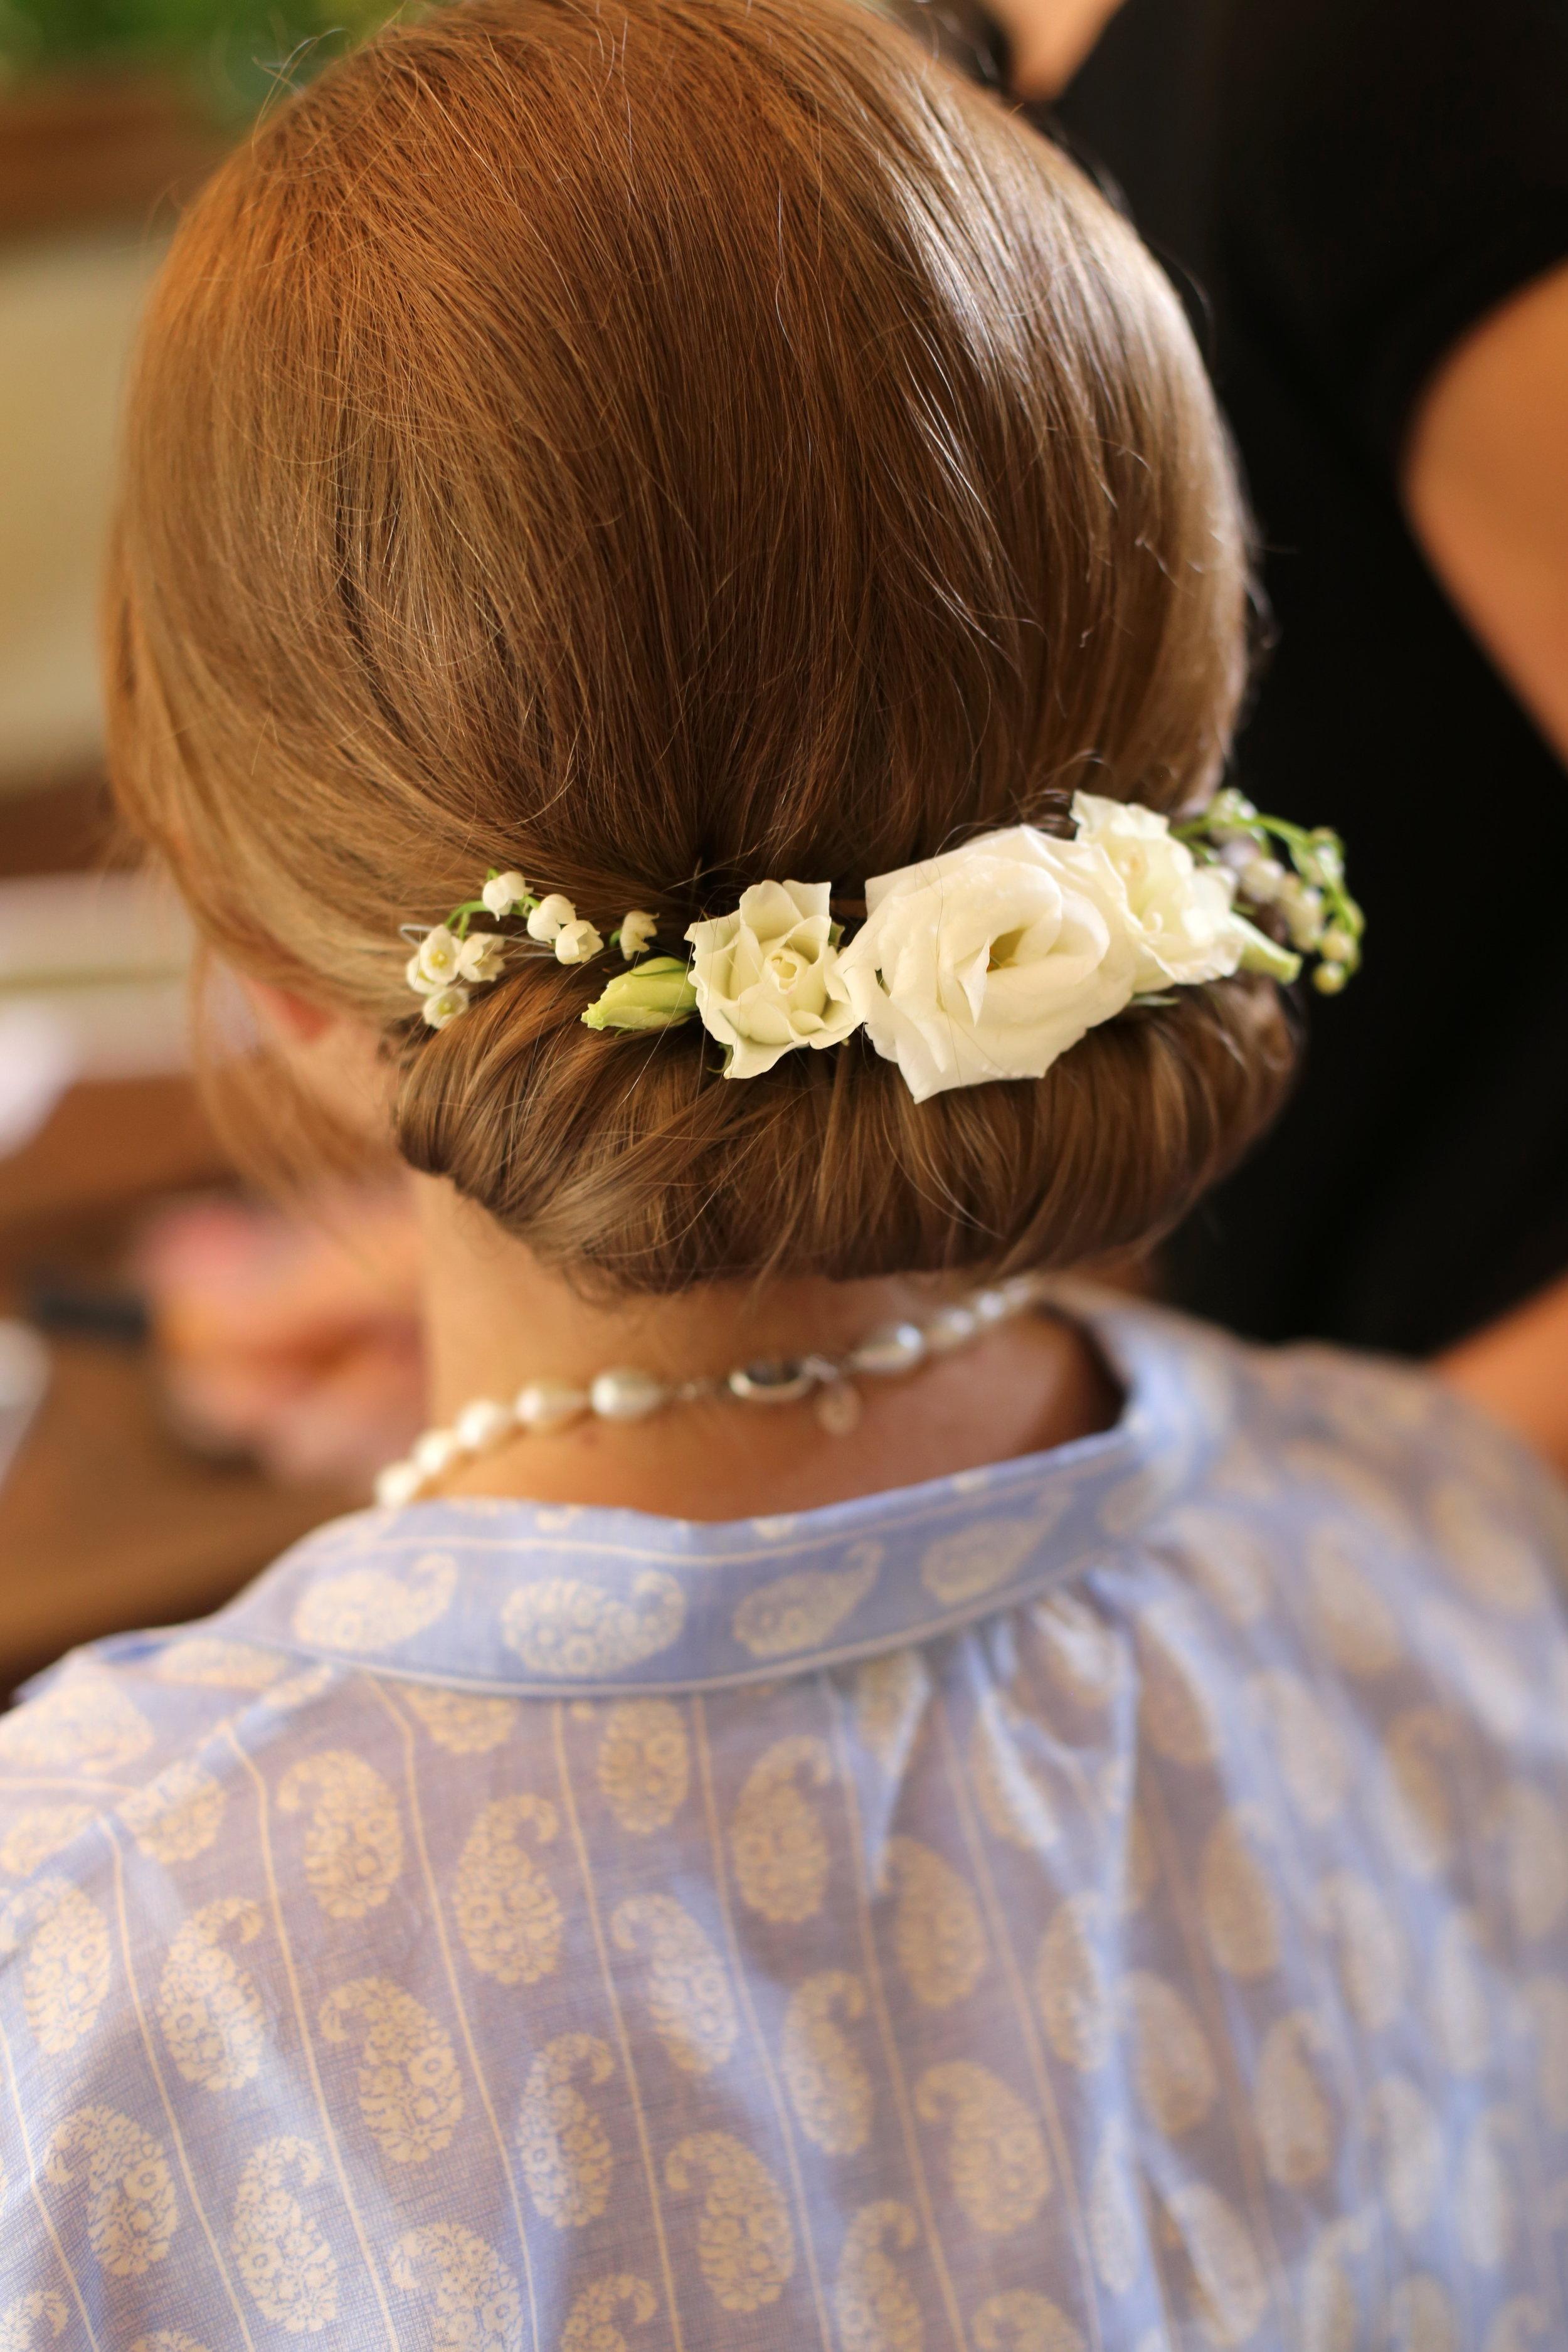 MIRIAM_FAITH_WEDDING_FLOWERS_HAIR_LILLYOFTHEVALLEY.JPG